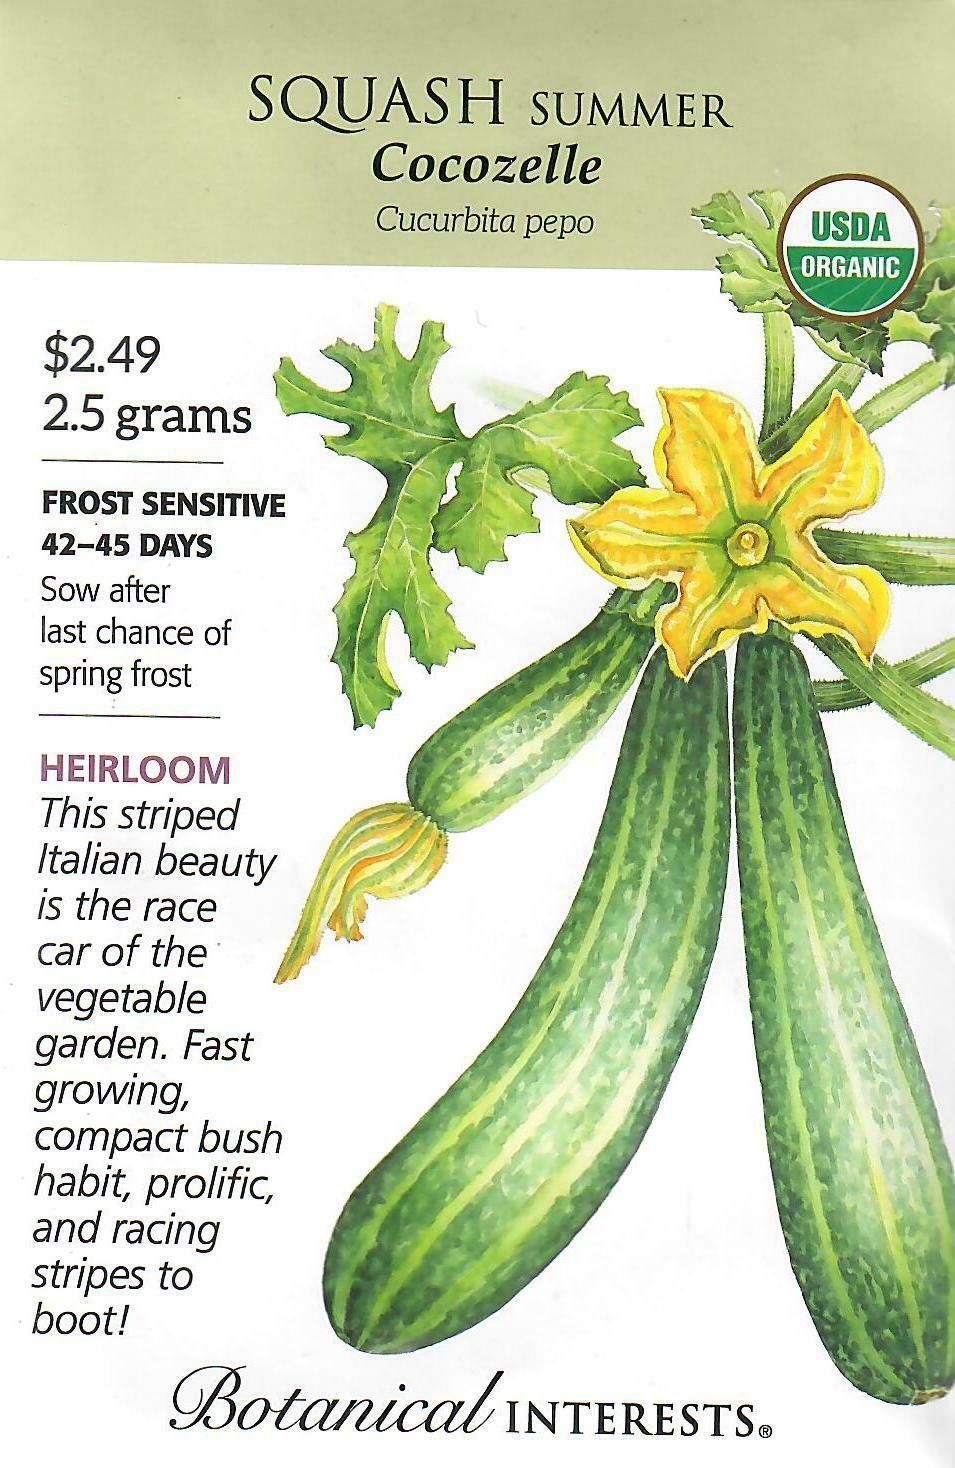 Squash Summer Cocozelle Org Botanical Interests